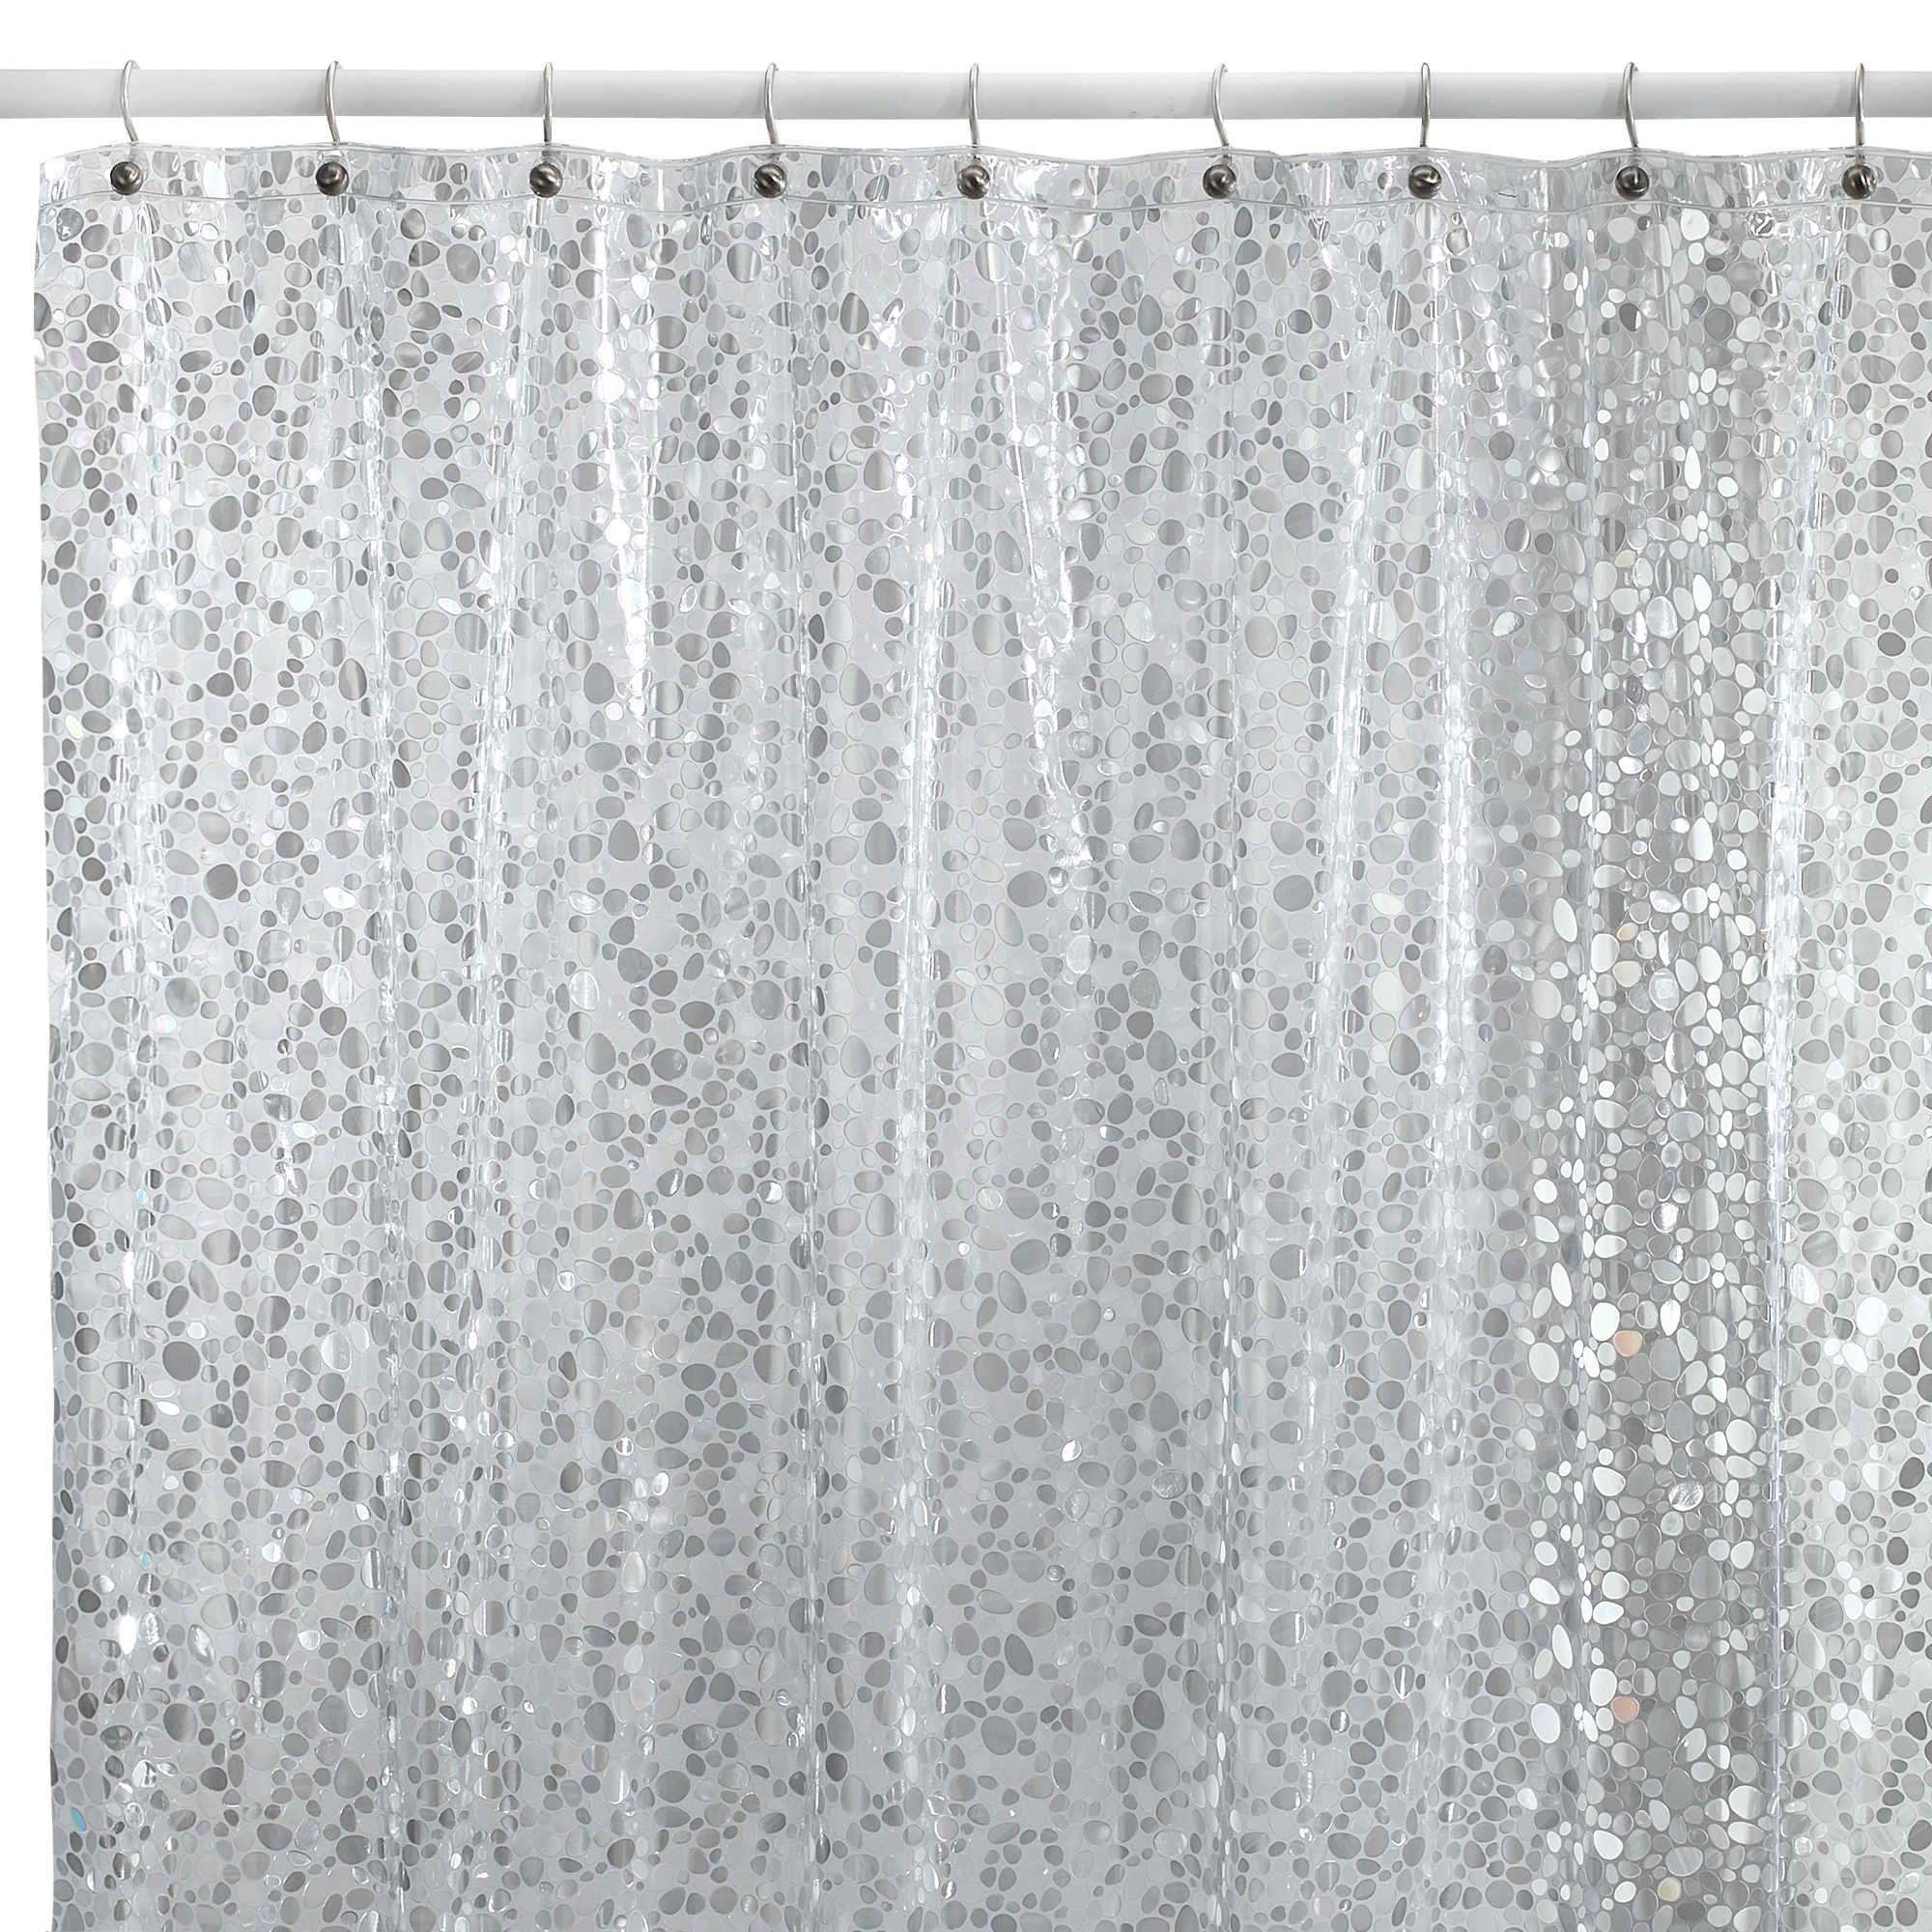 Pebbles Shower Curtain In Silver Cunningham23 Im Kinda Diggin This